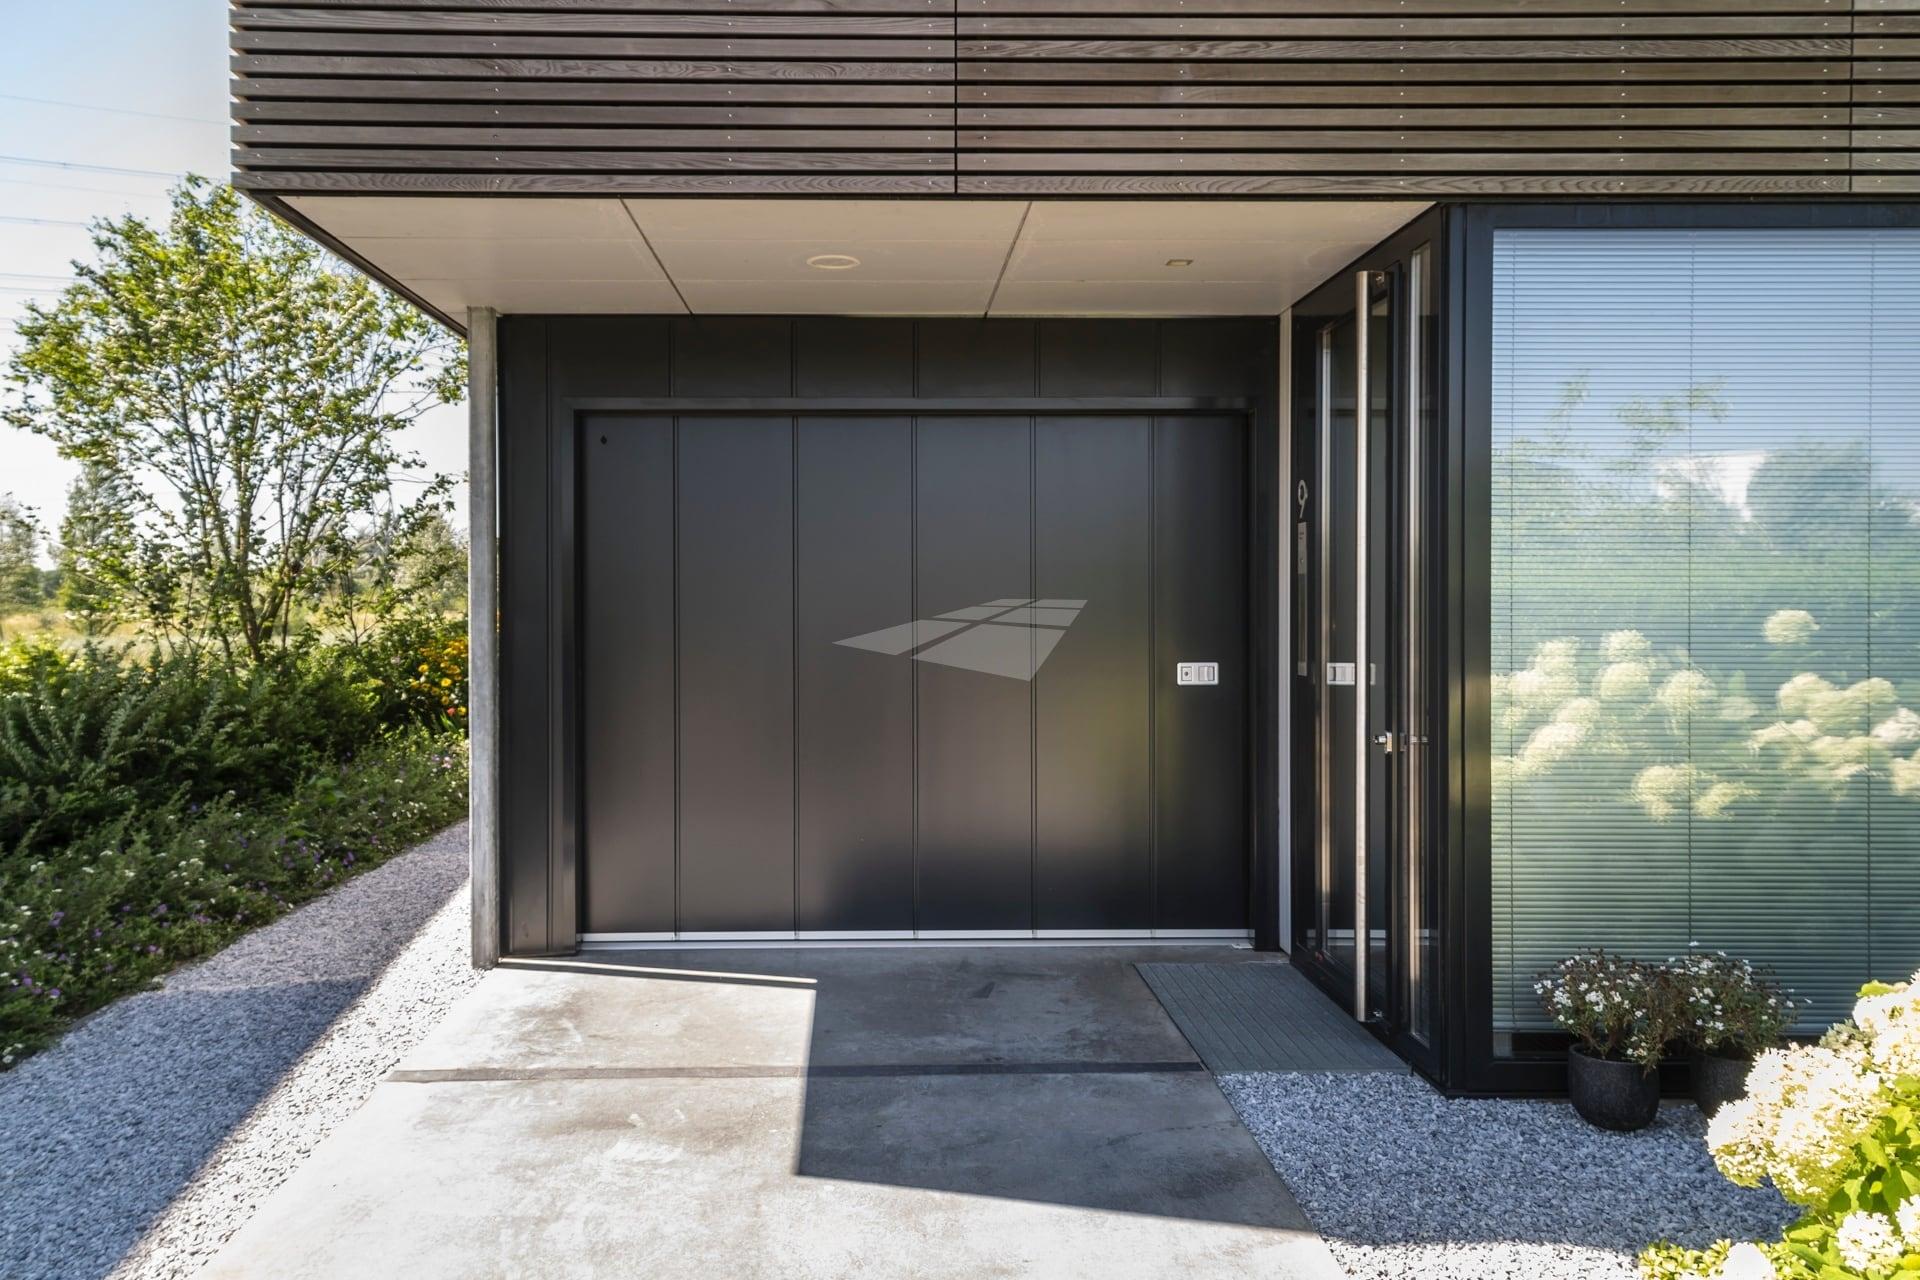 Select Windows kunststof kozijnen - Hörmann garagedeur antraciet metallic - referentie garagedeur Amsterdam